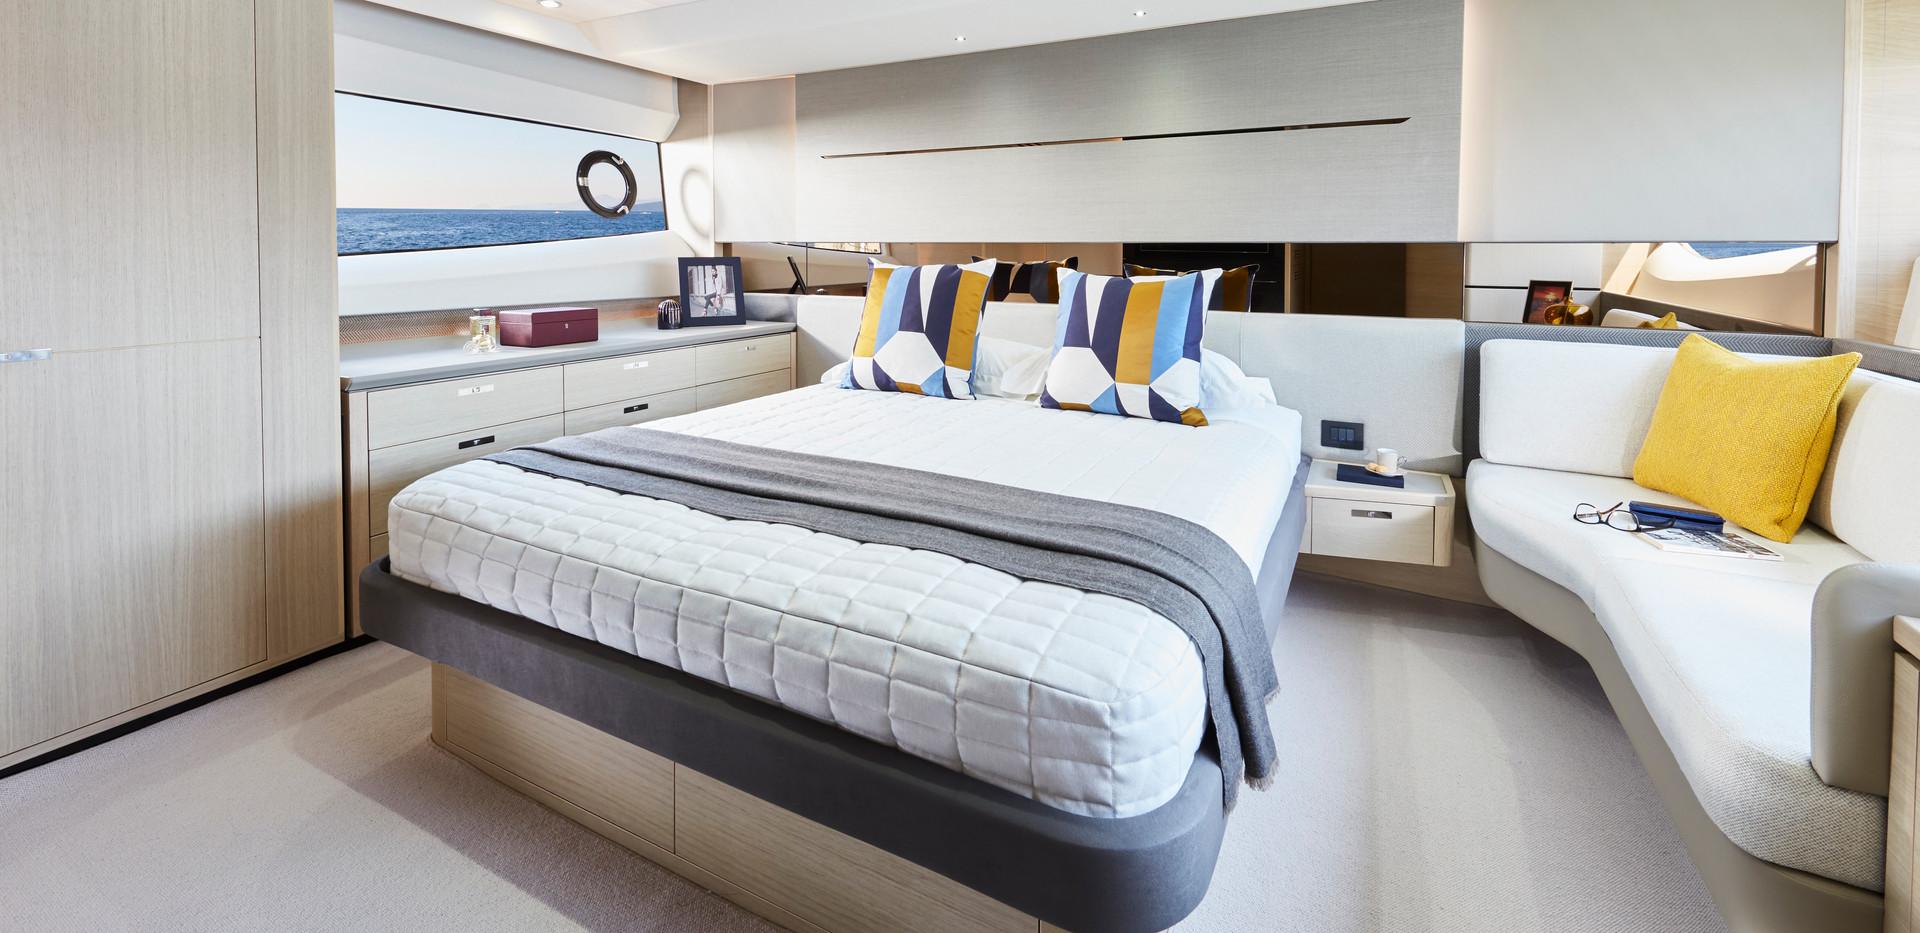 v60-interior-owners-stateroom-alba-oak-s